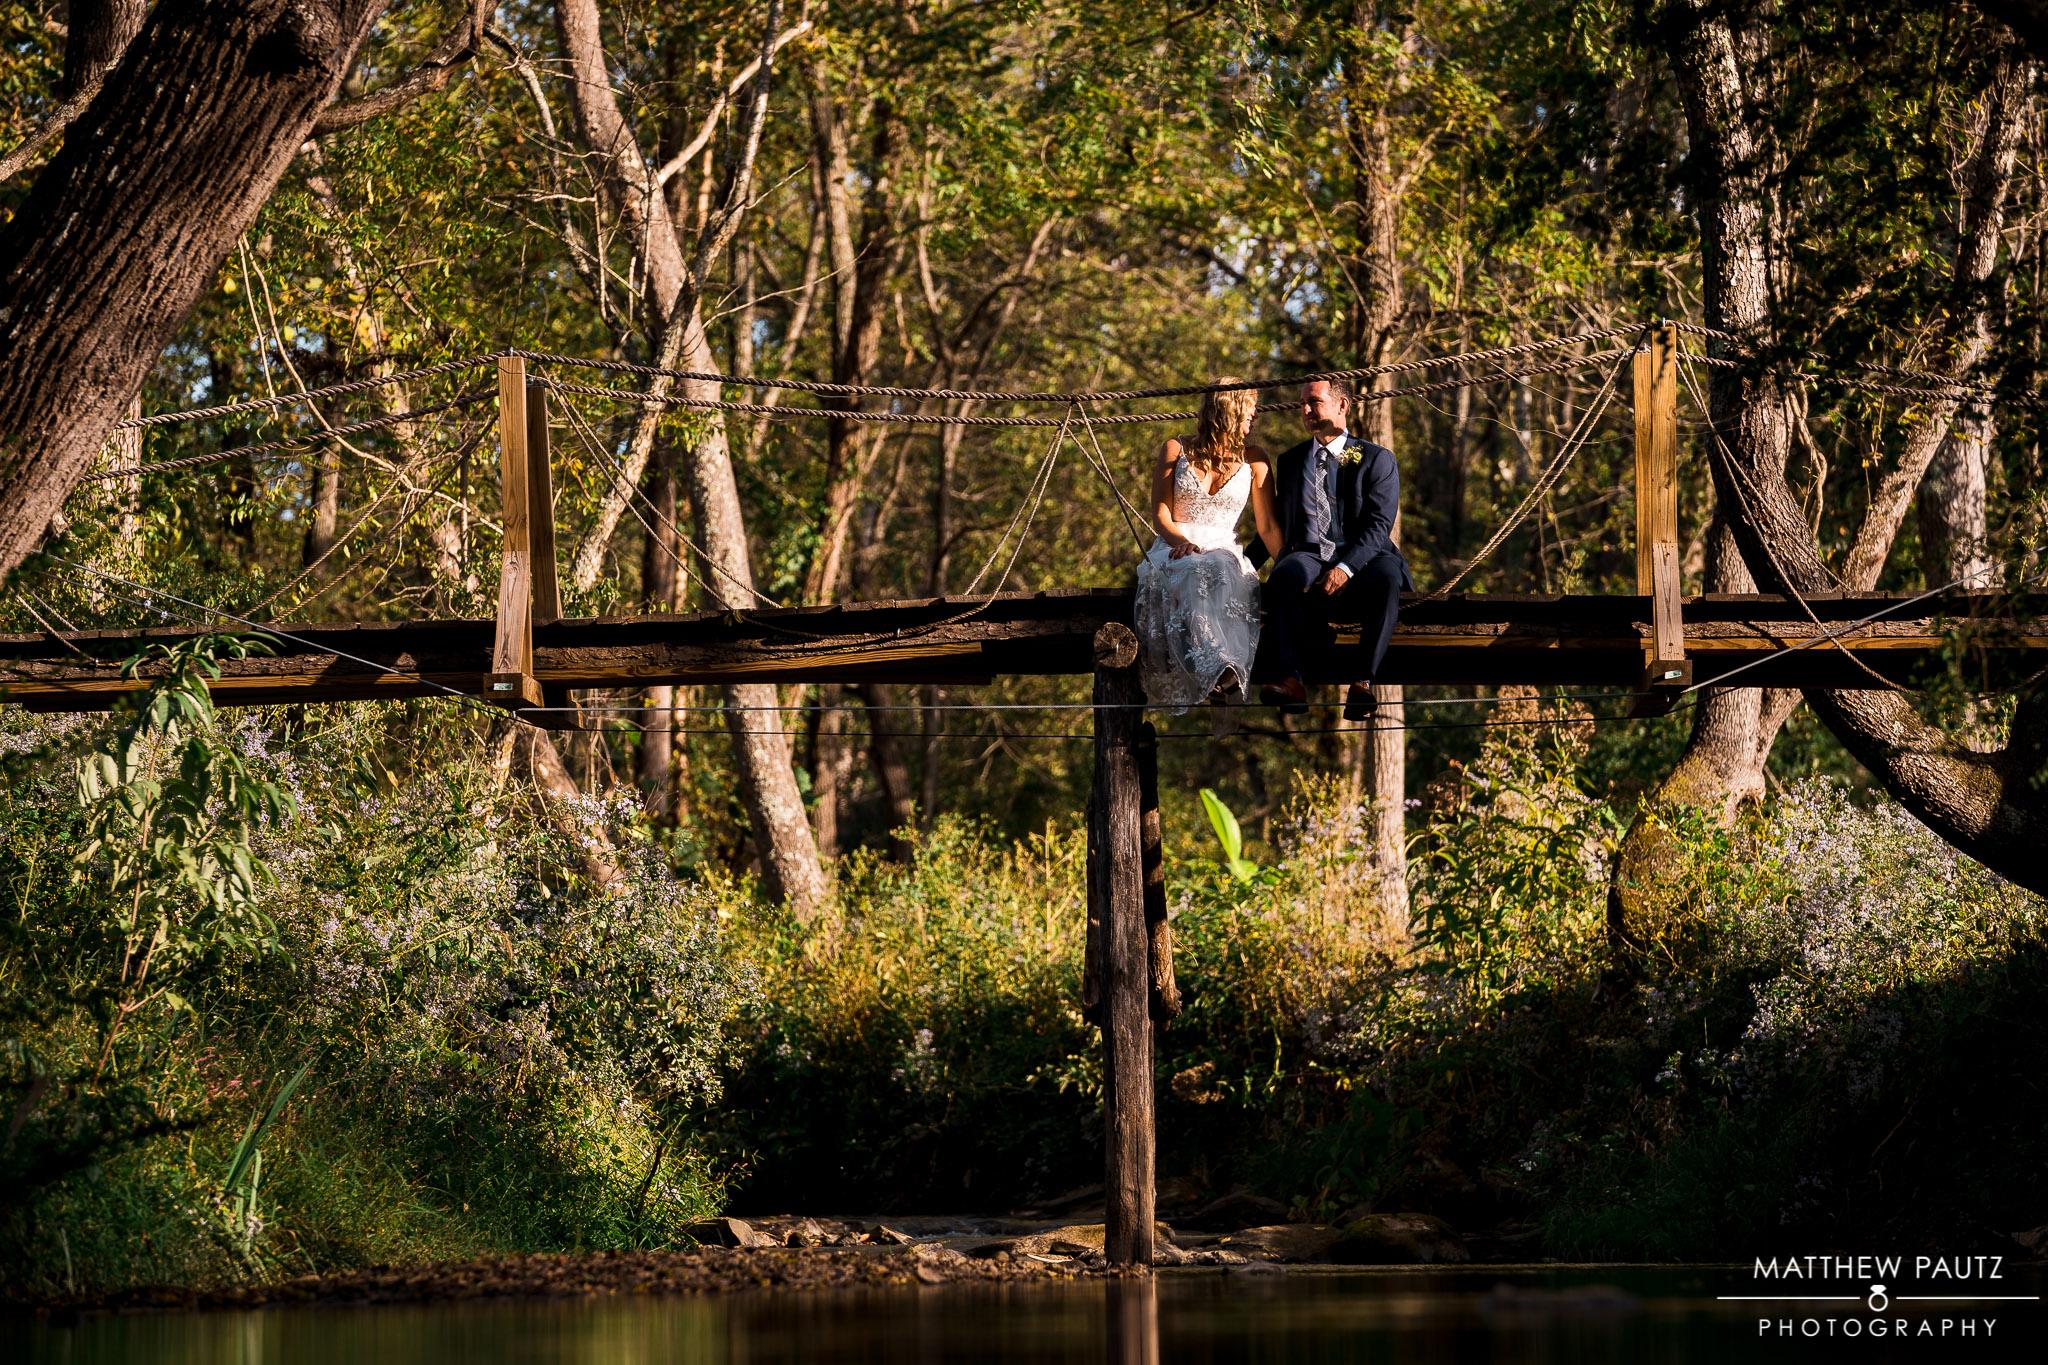 Bride and groom sitting on bridge together after wedding ceremony in Asheville